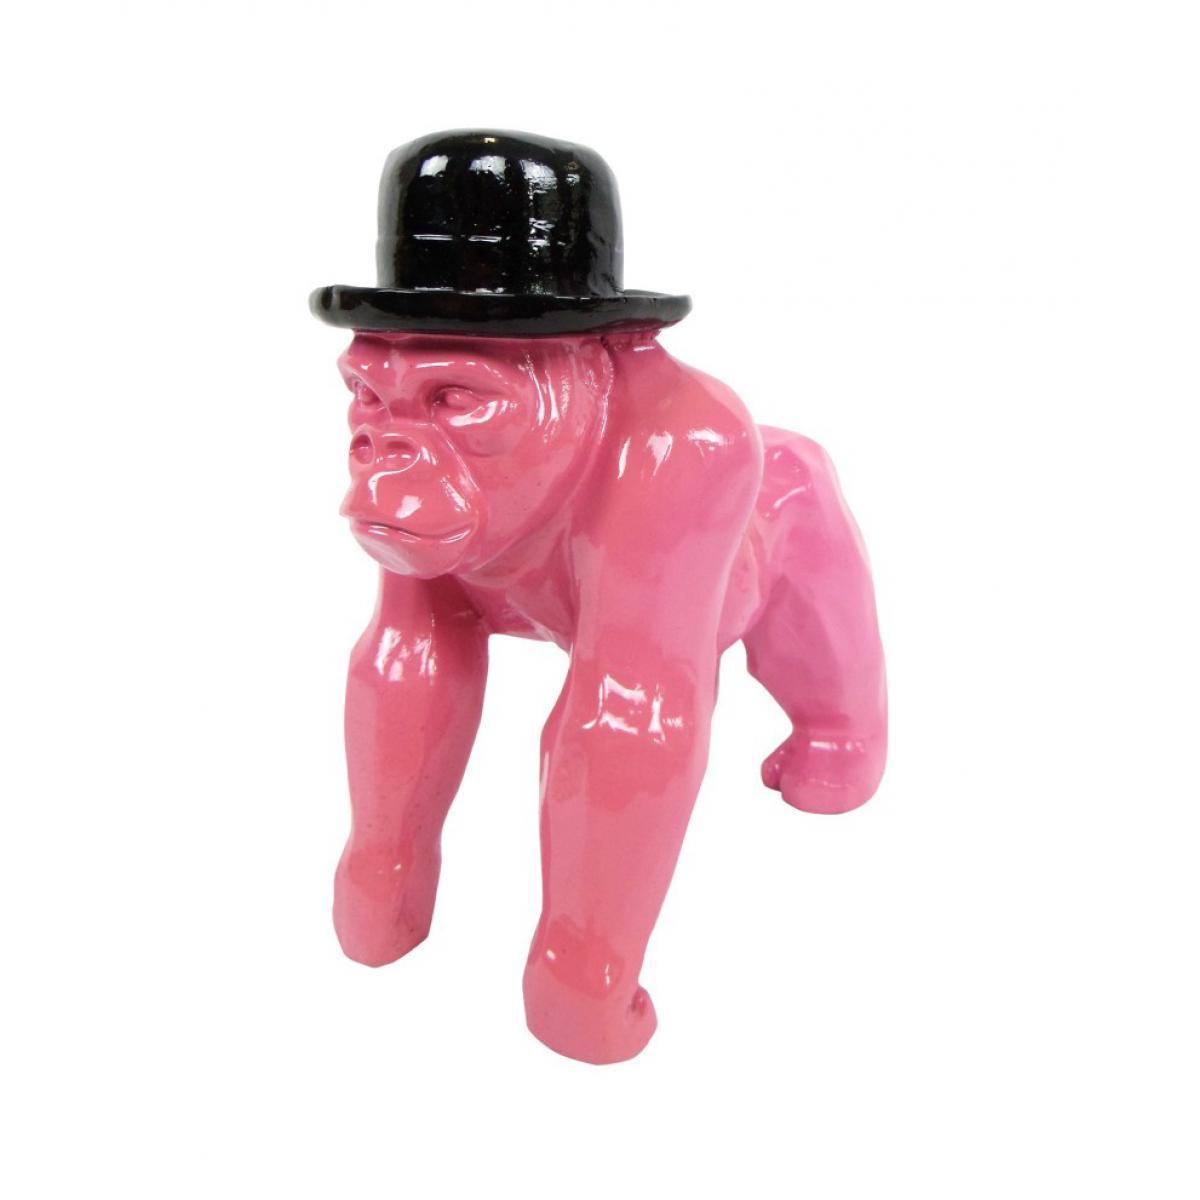 Multideco Statue en résine singe gorille fuchsia en origami - 25 cm